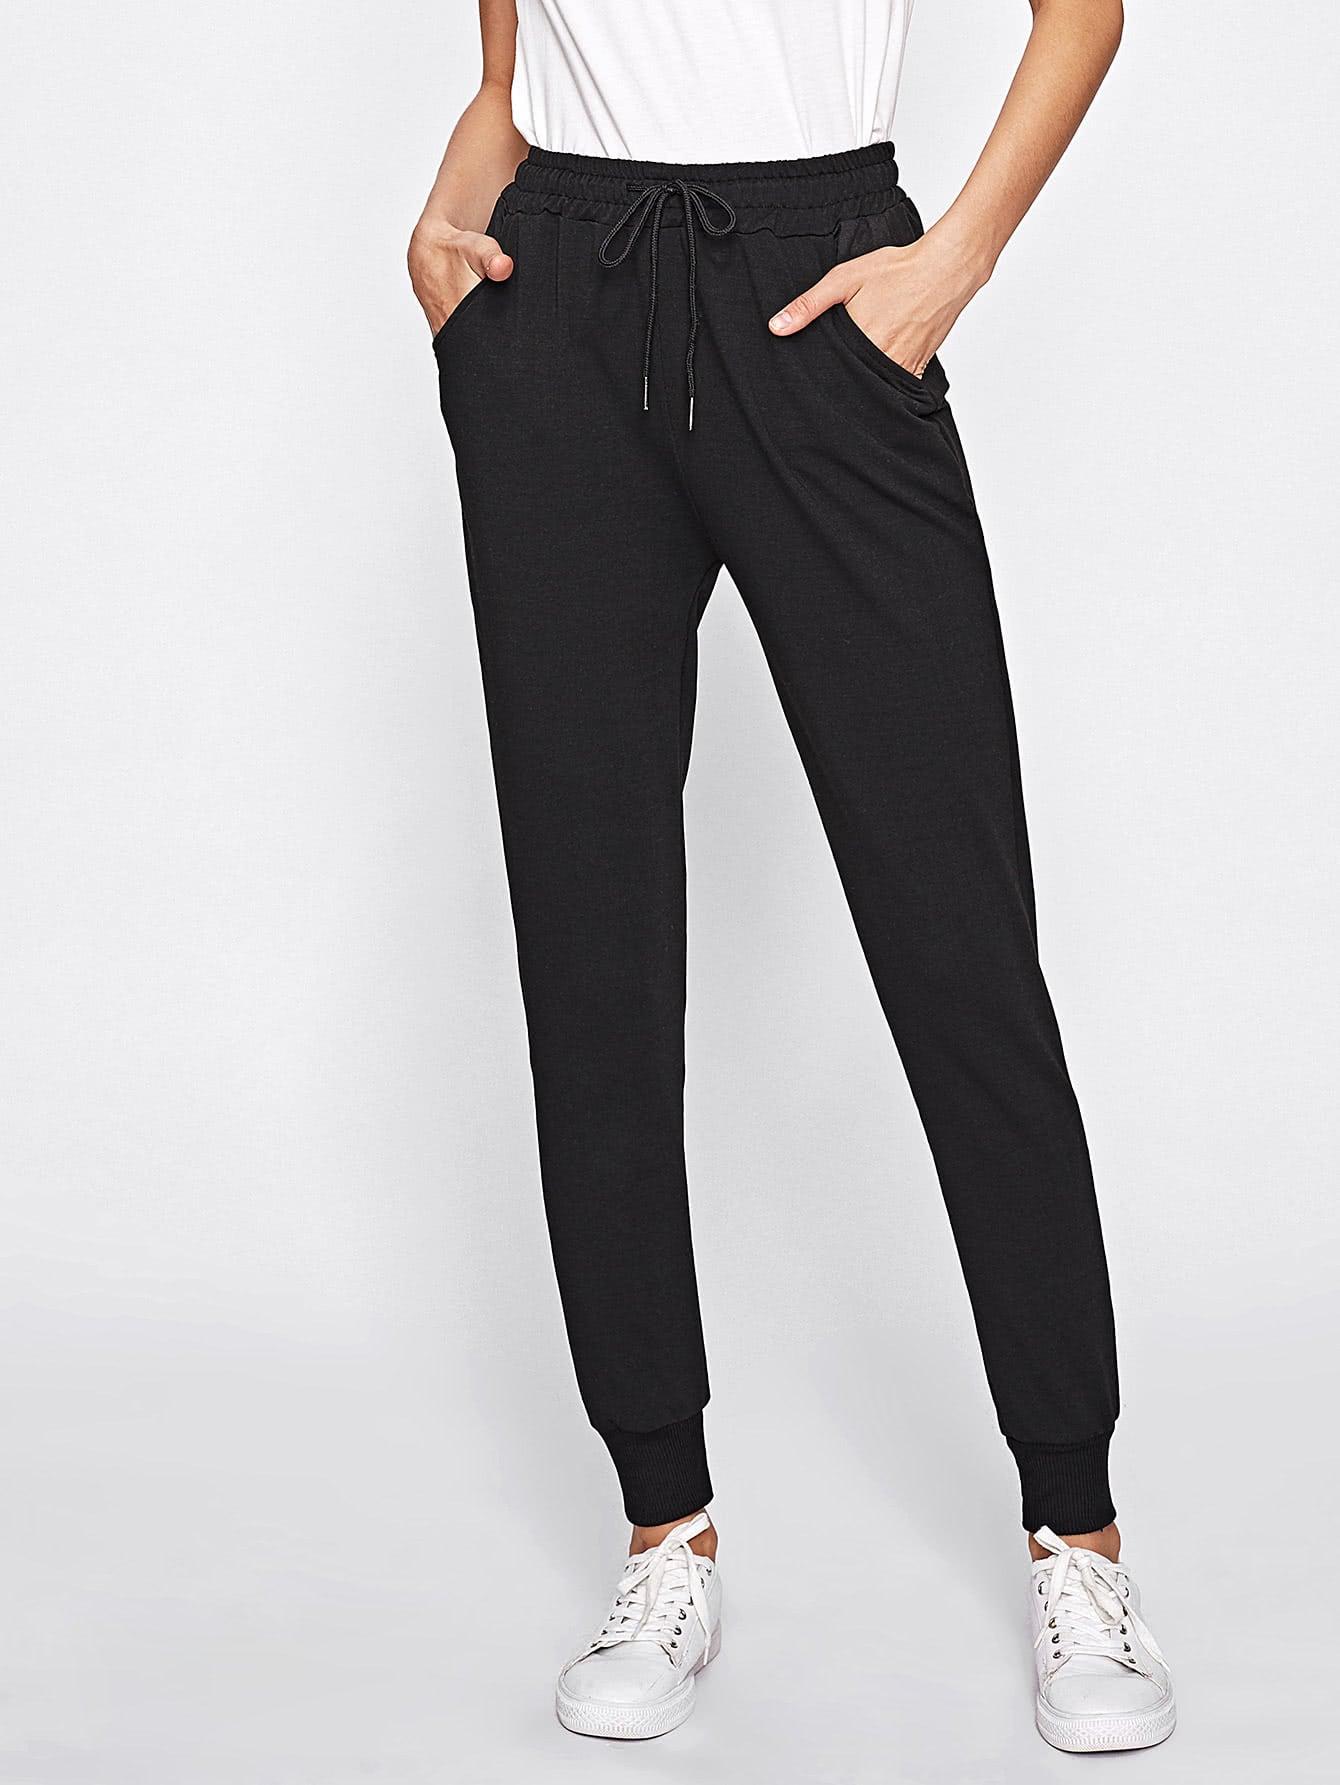 Drawstring Waist Sweatpants pants170809101